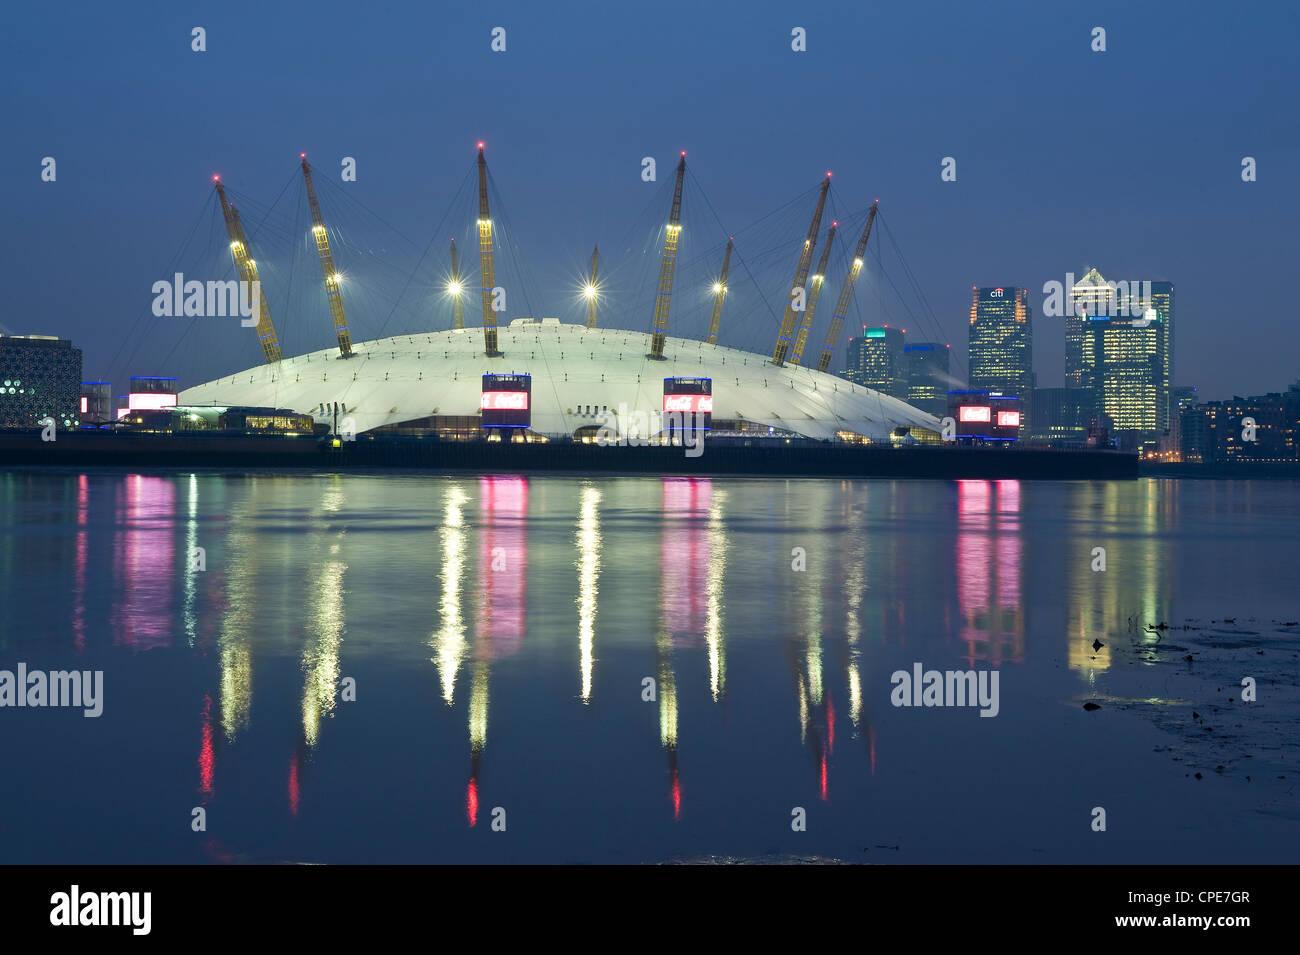 The O2 Arena, Docklands, London, England, United Kingdom, Europe - Stock Image